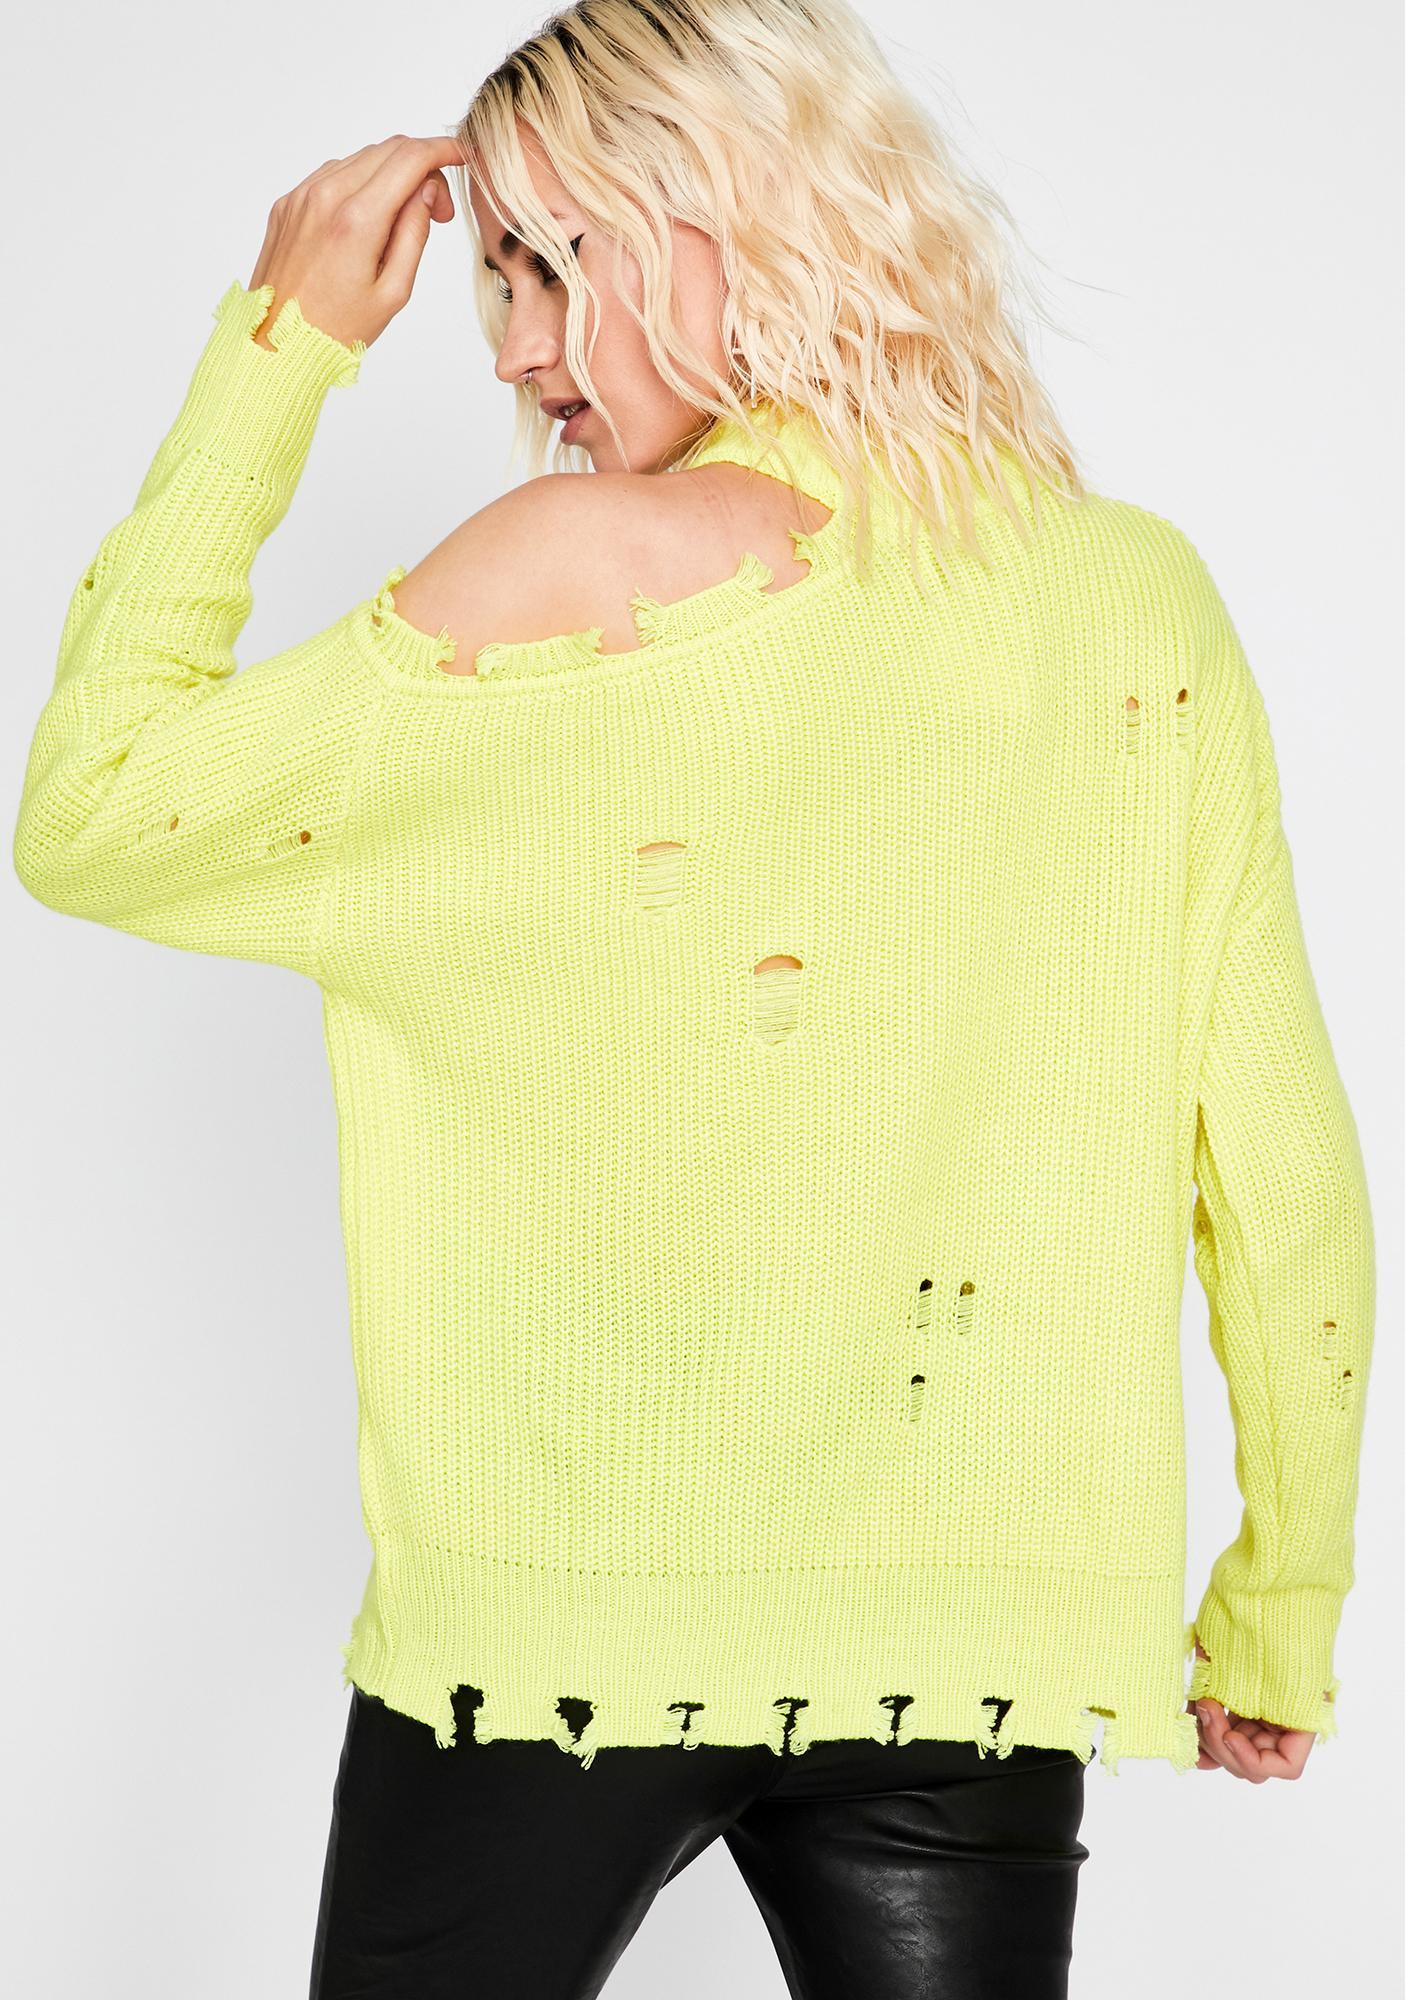 Worn To Be Wild Distressed Sweater